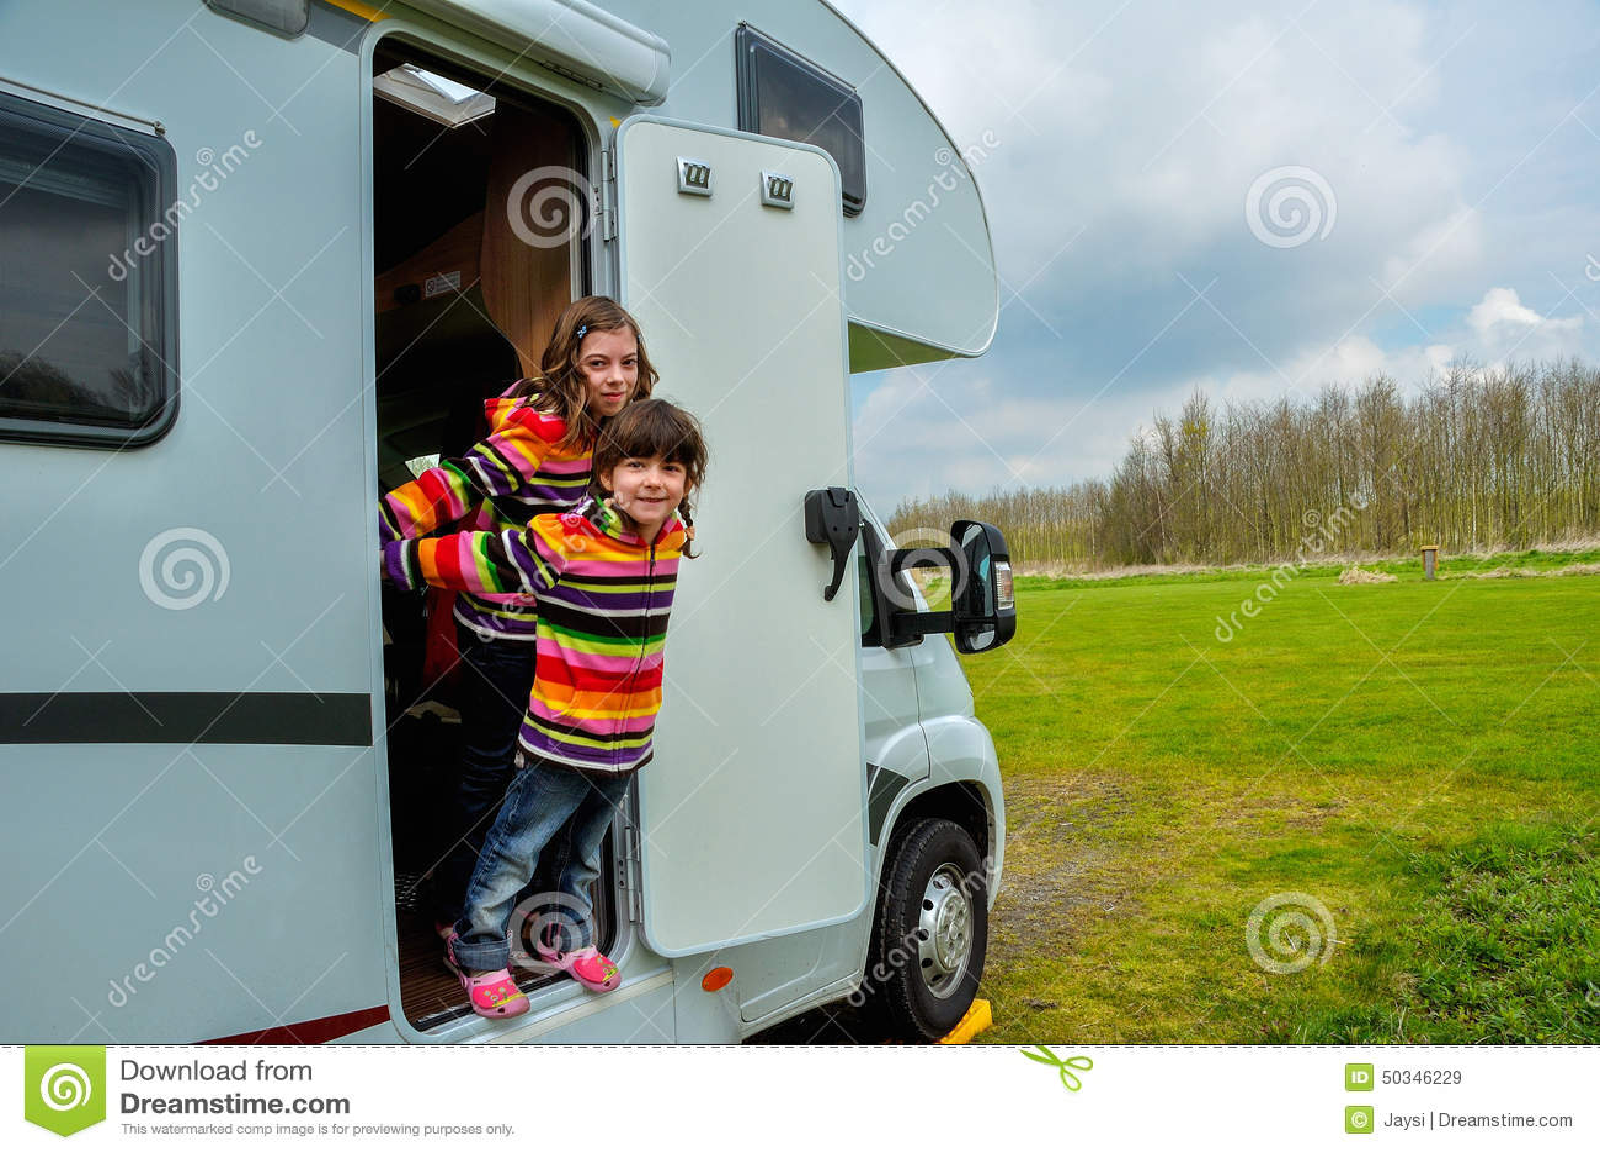 Park Find Finland Caravan